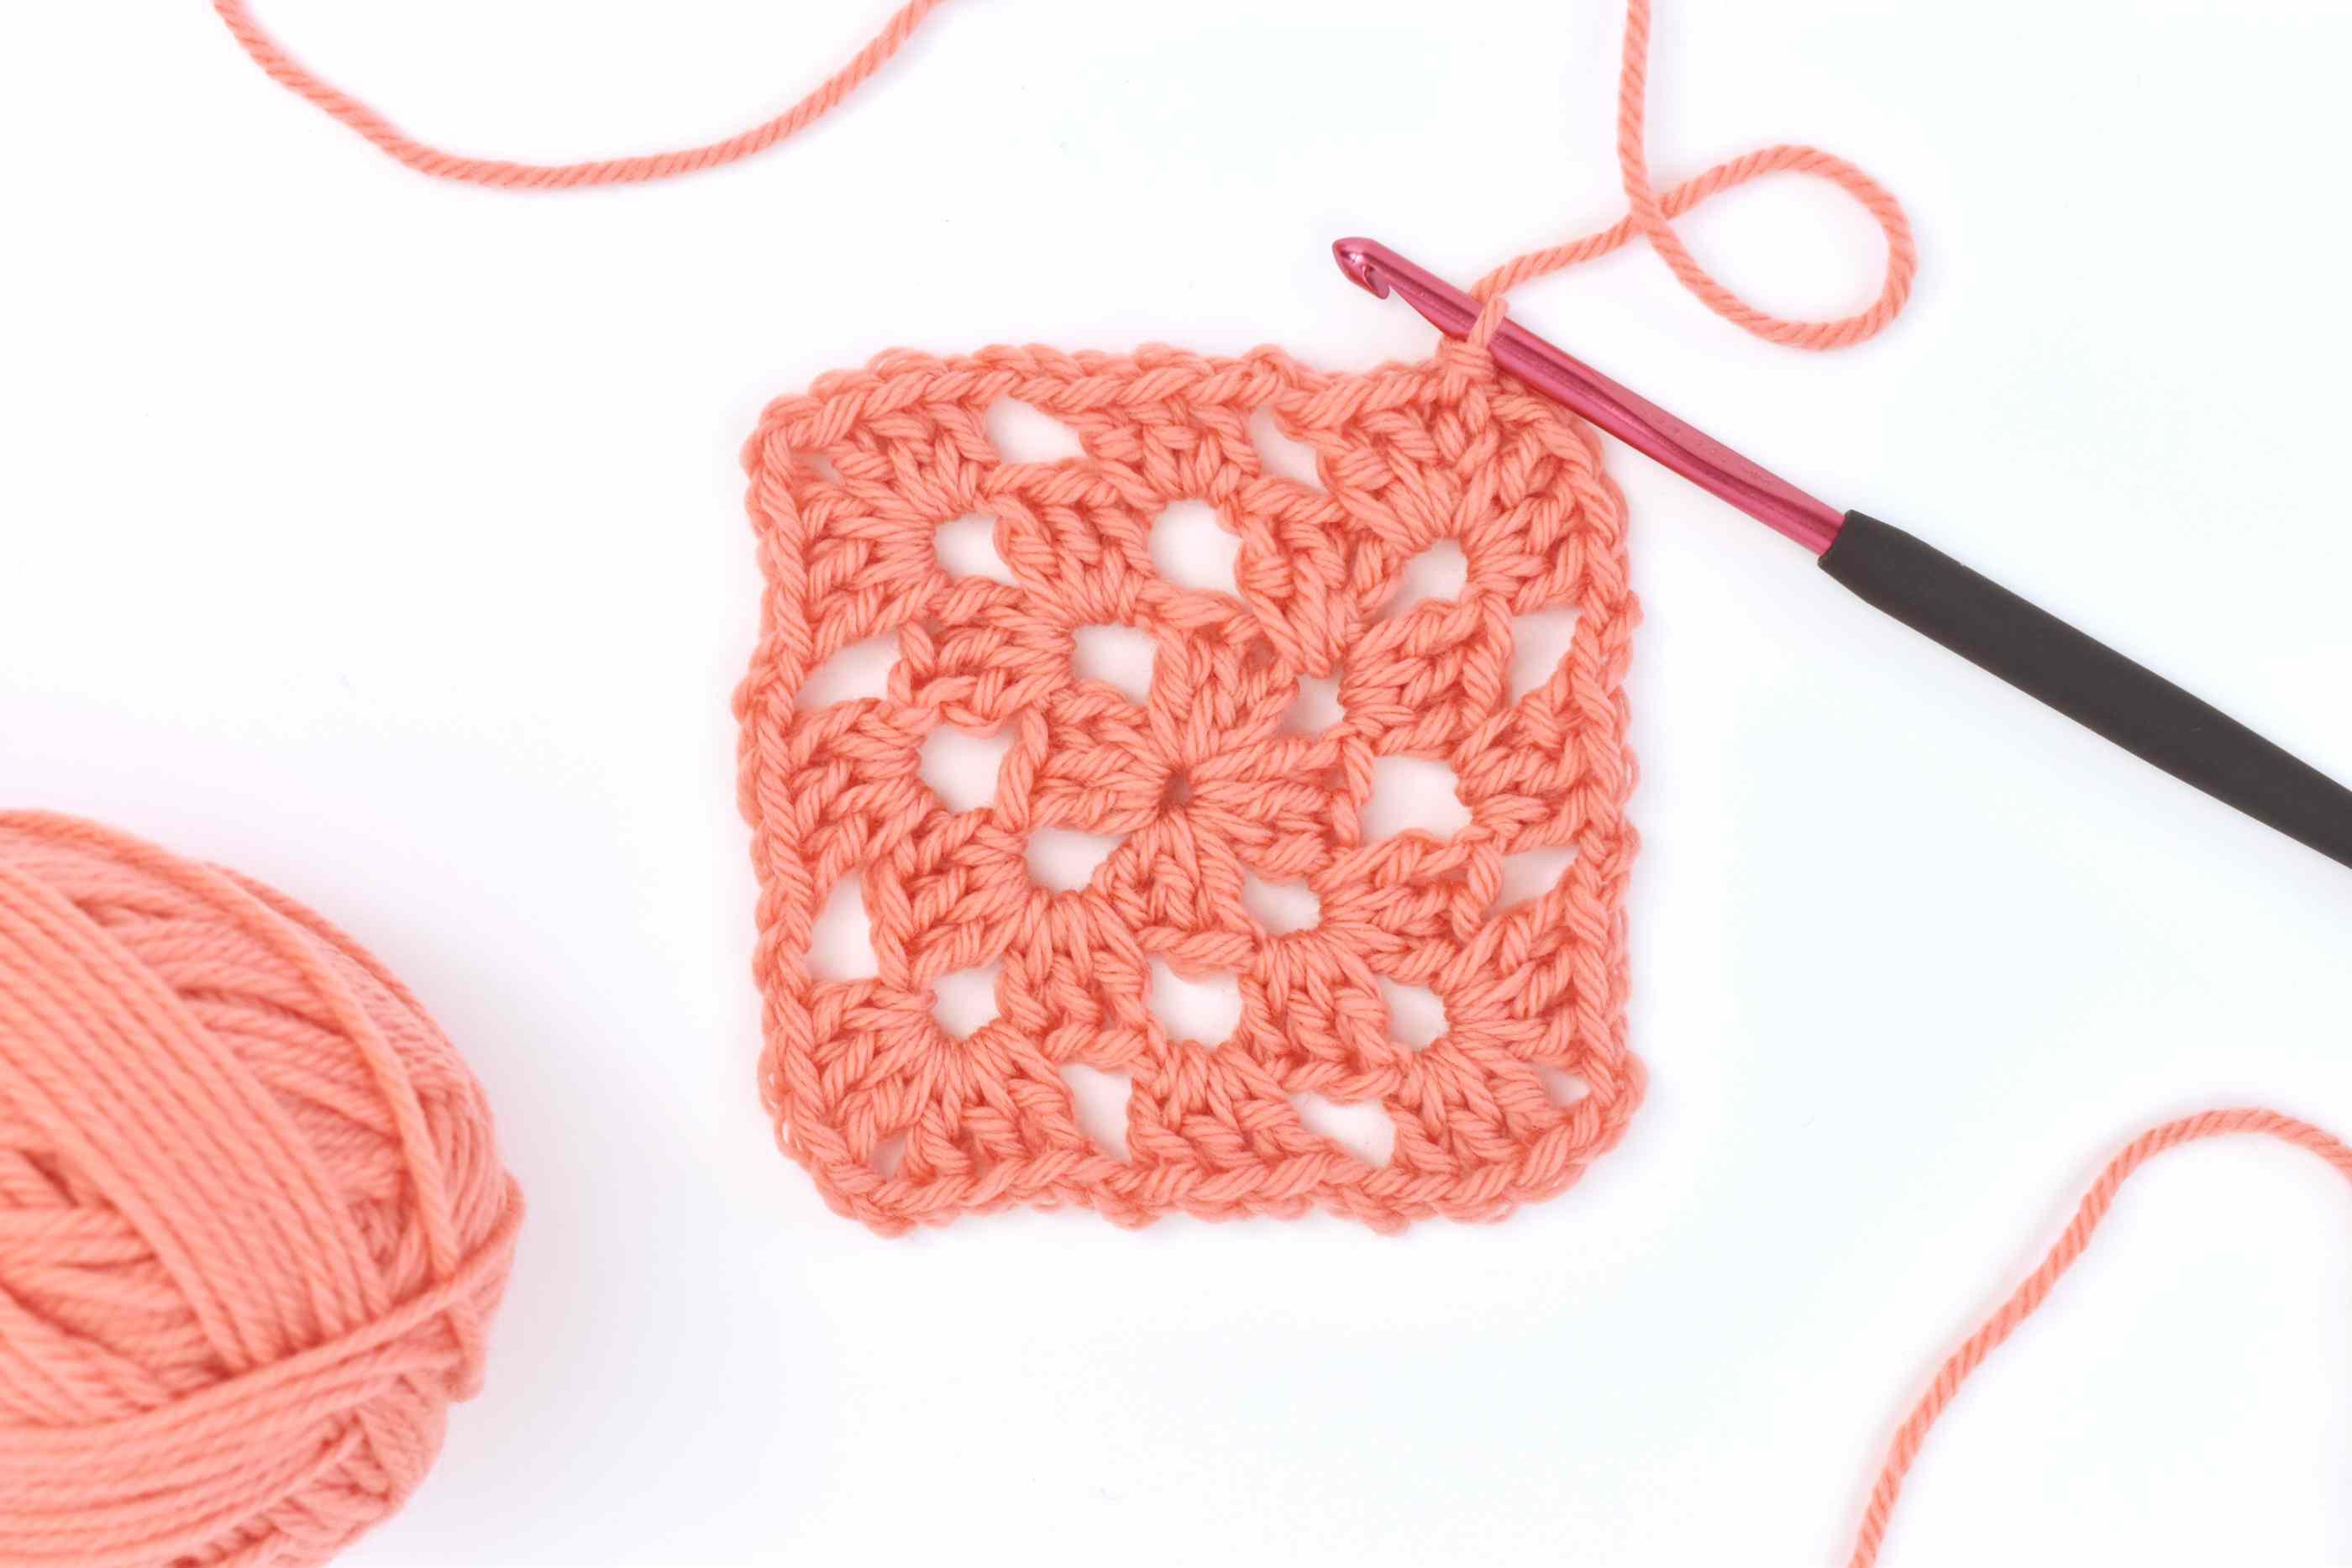 crochet granny square diagram glock 22 nomenclature printable how to a classic basic